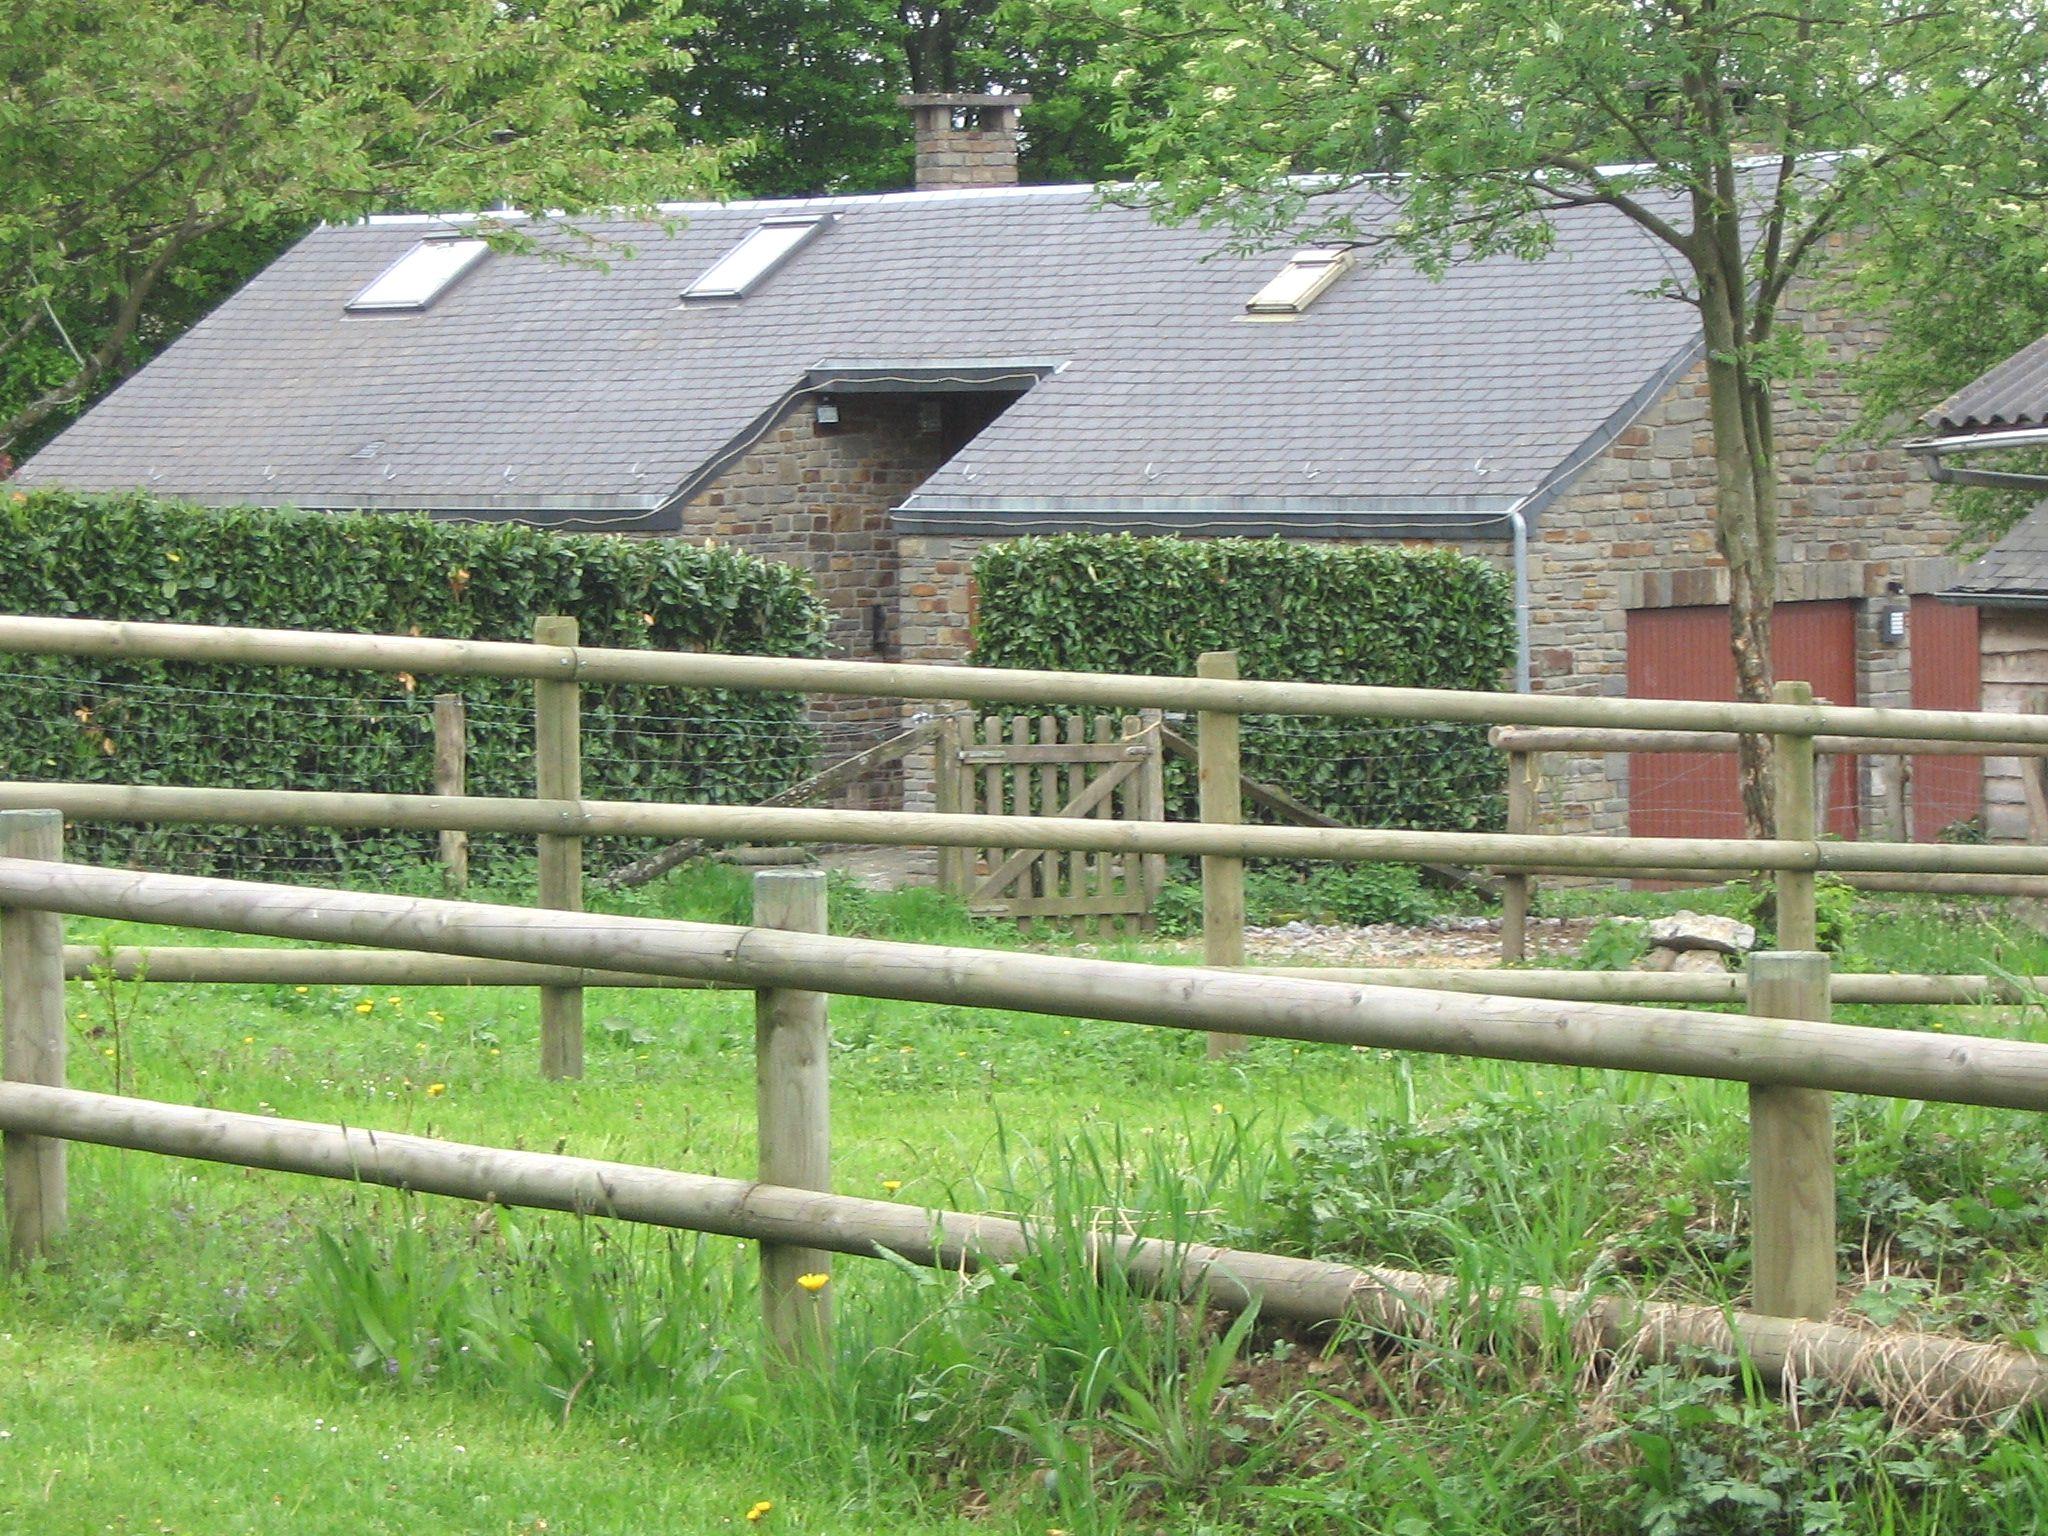 equestrian equiplent fences obstacle bar box for horses. Black Bedroom Furniture Sets. Home Design Ideas